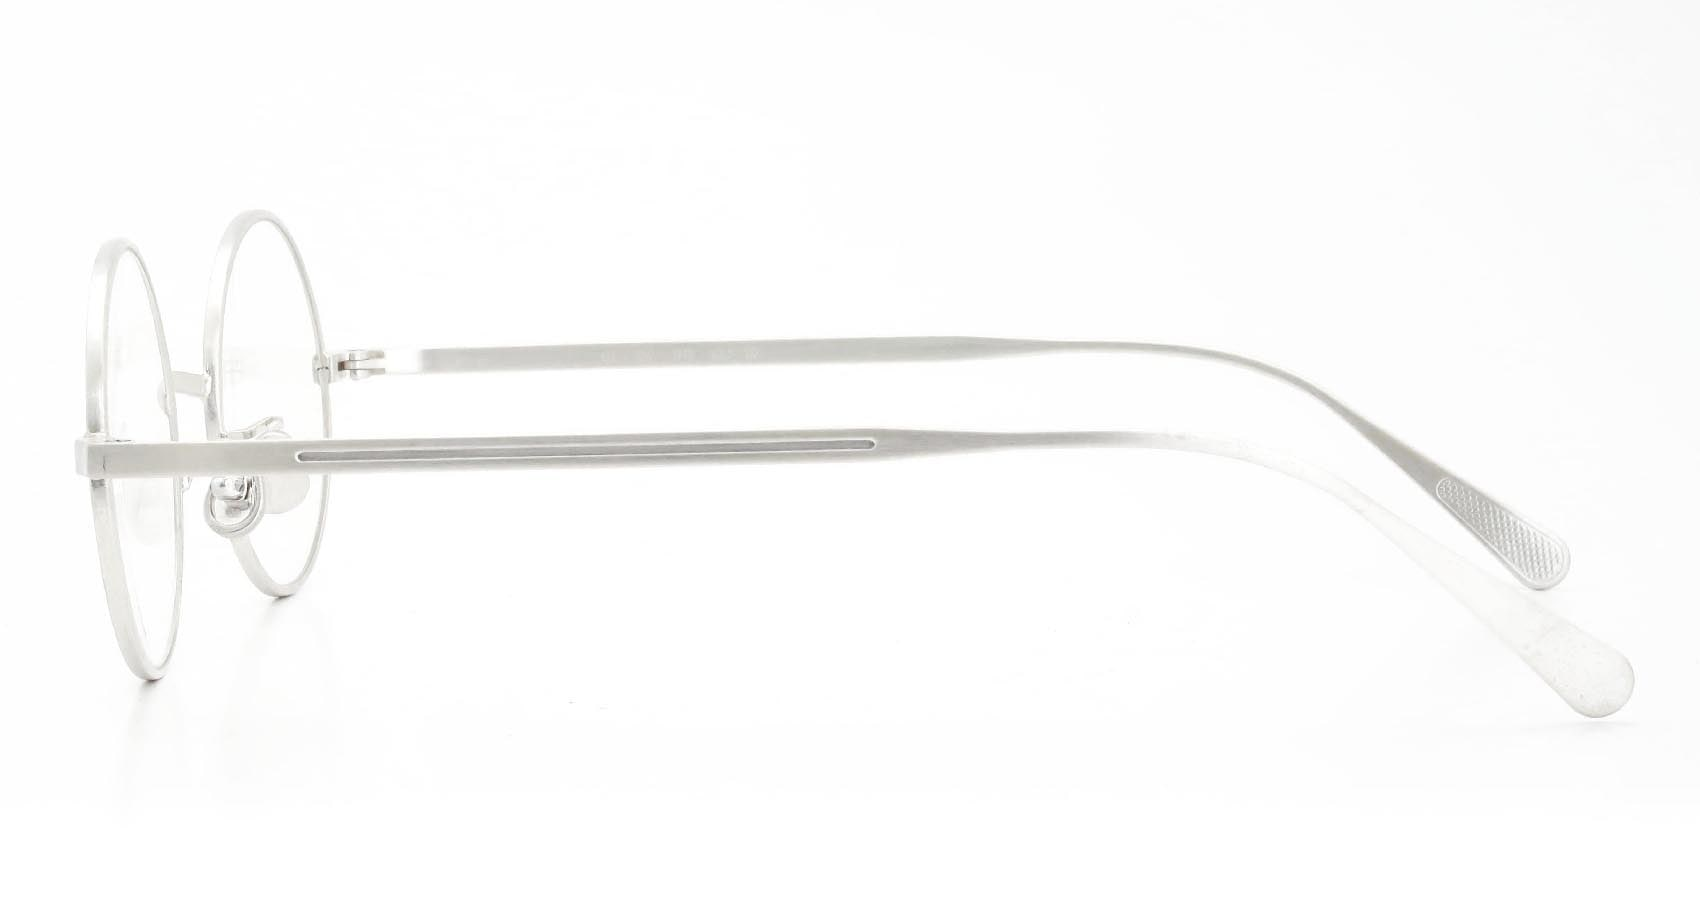 GERNOT LINDNER GL200 mod.206 Golf 3